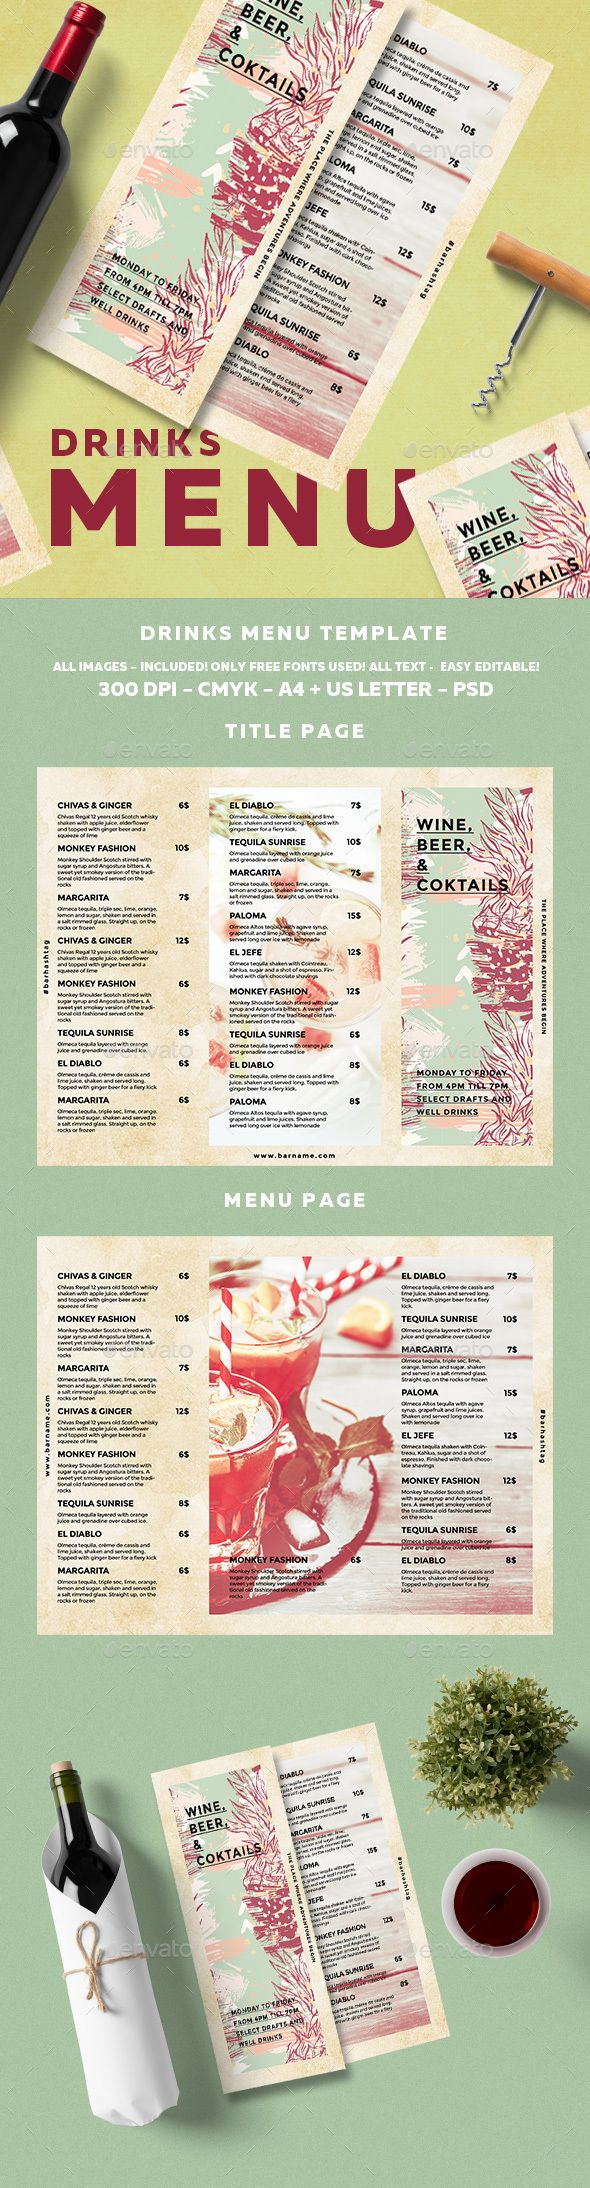 Cocktail Drinks Menu Template PSD. Download here: https://graphicriver.net/item/cocktail-drinks-menu/17299227?ref=ksioks